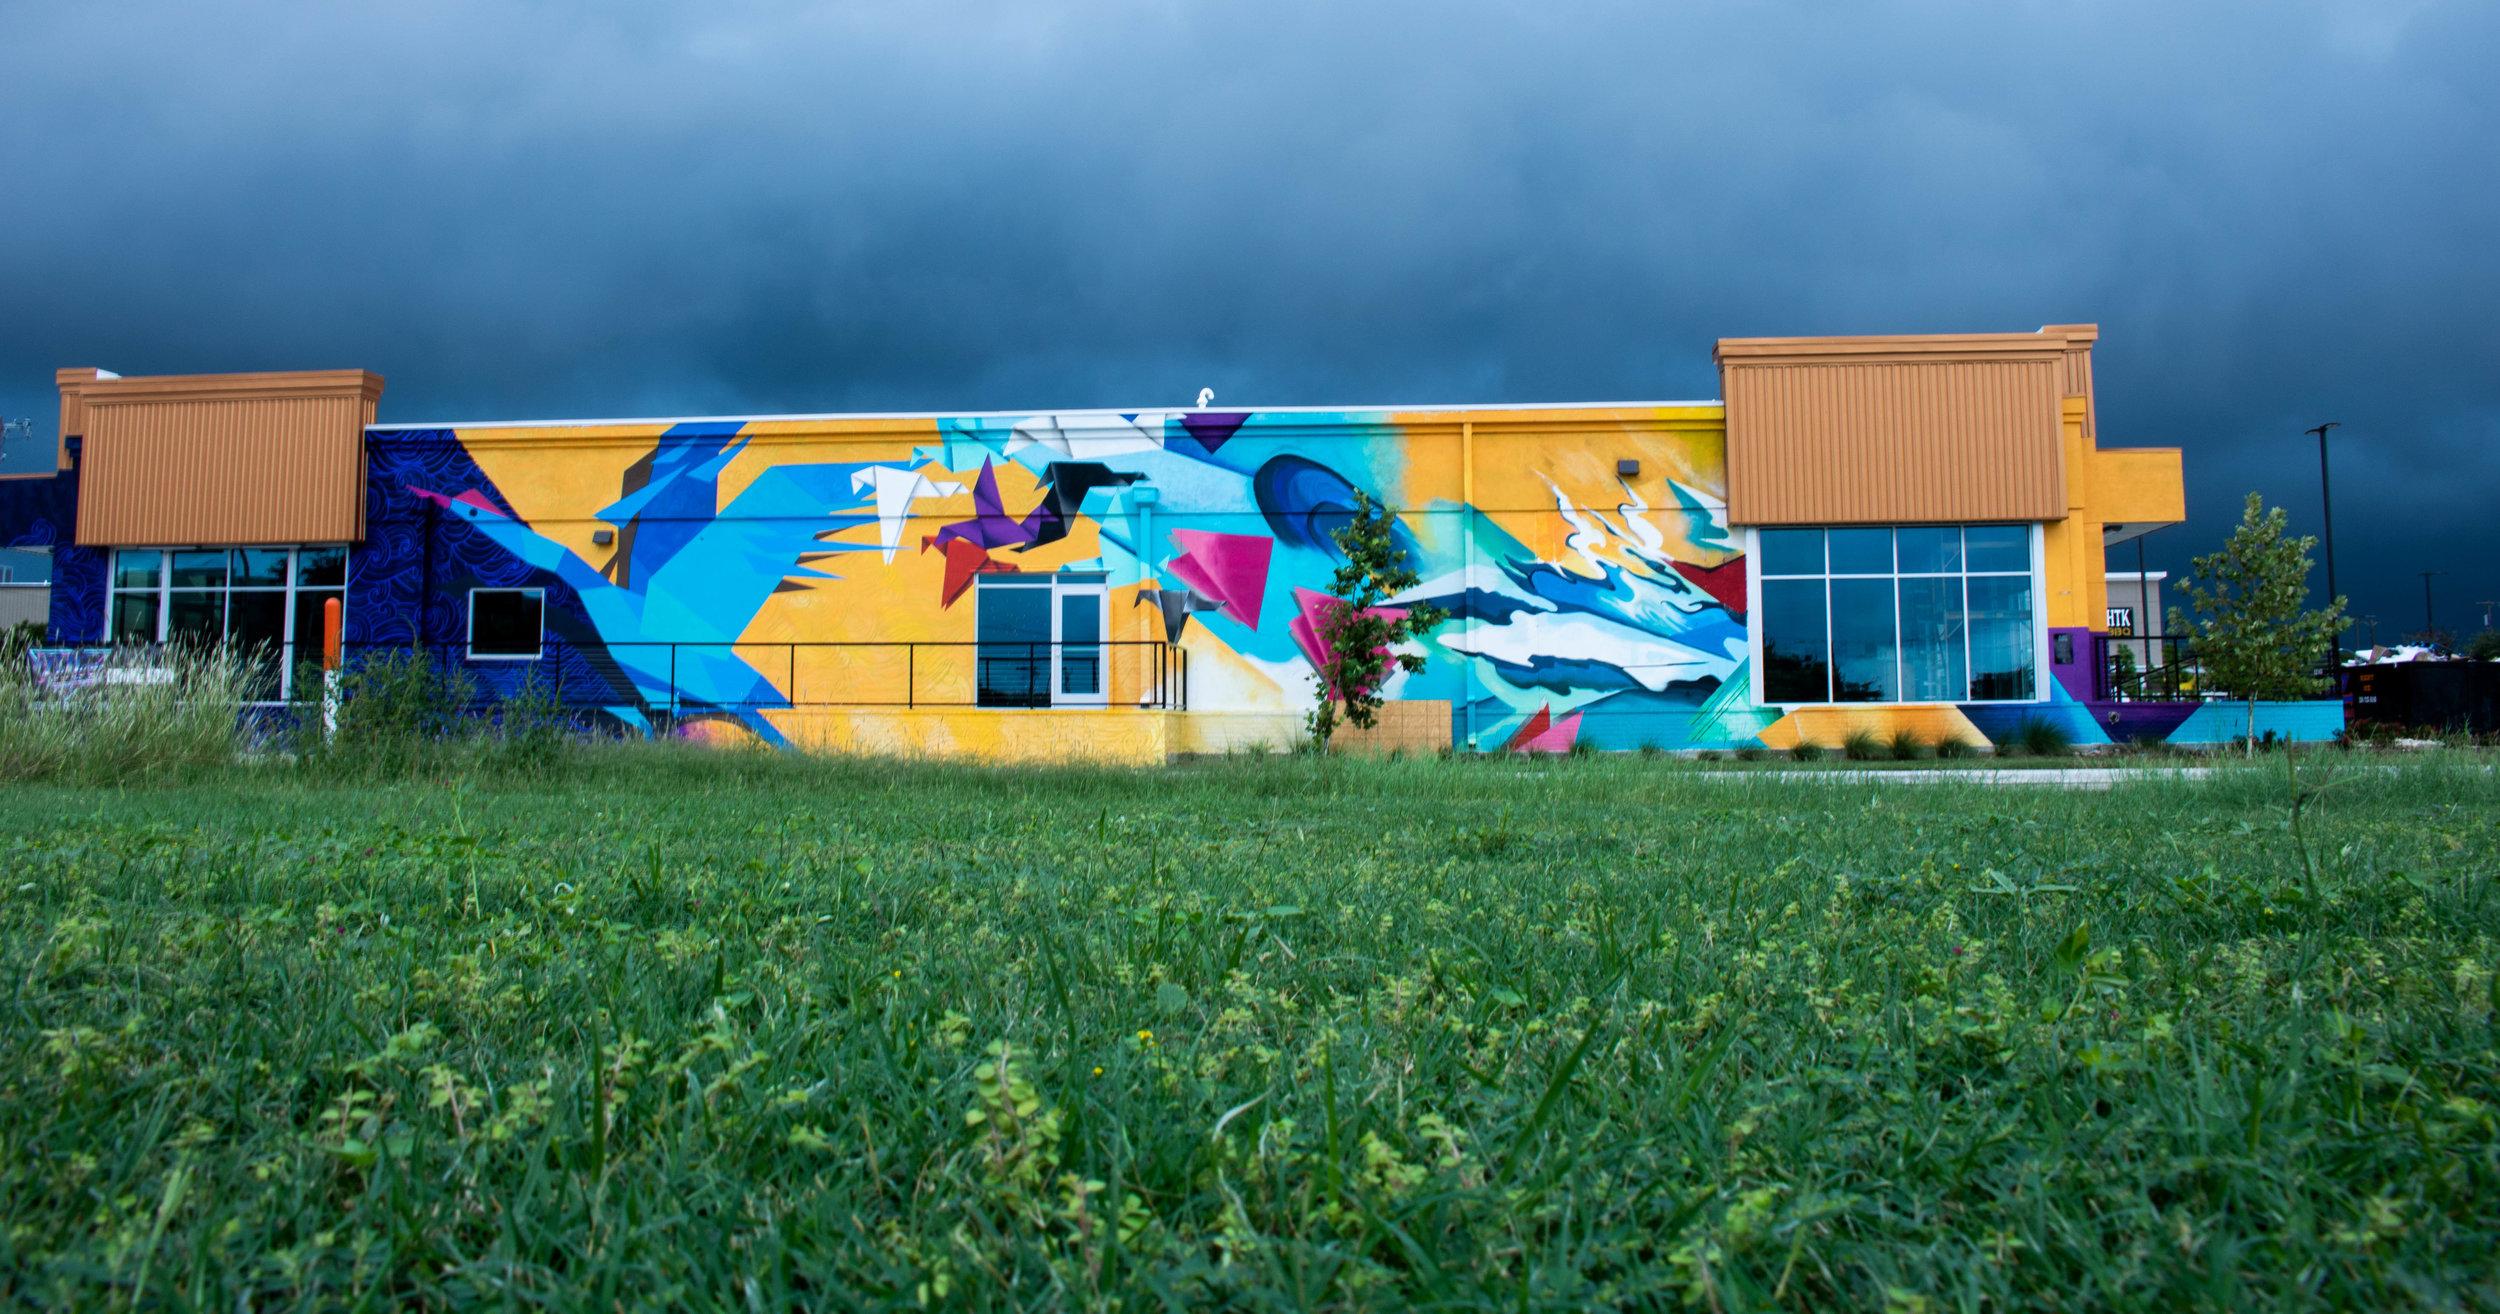 1000 Hopes for Waco / ARTPrenticeship 2018